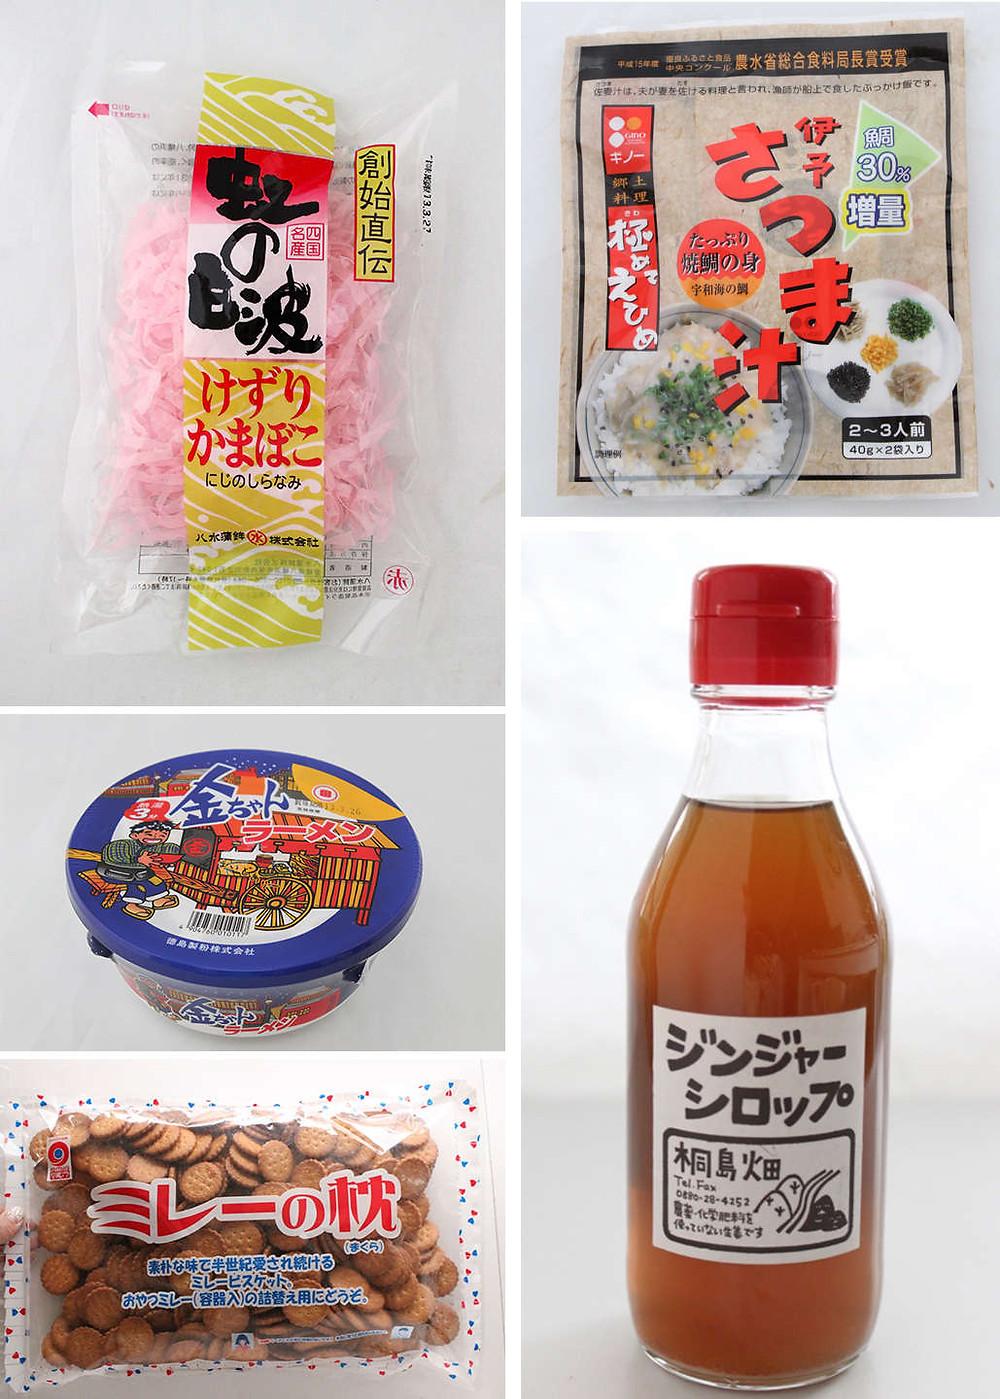 GoWest! ご当地スーパー特選「お土産ご当地食」西日本の巻